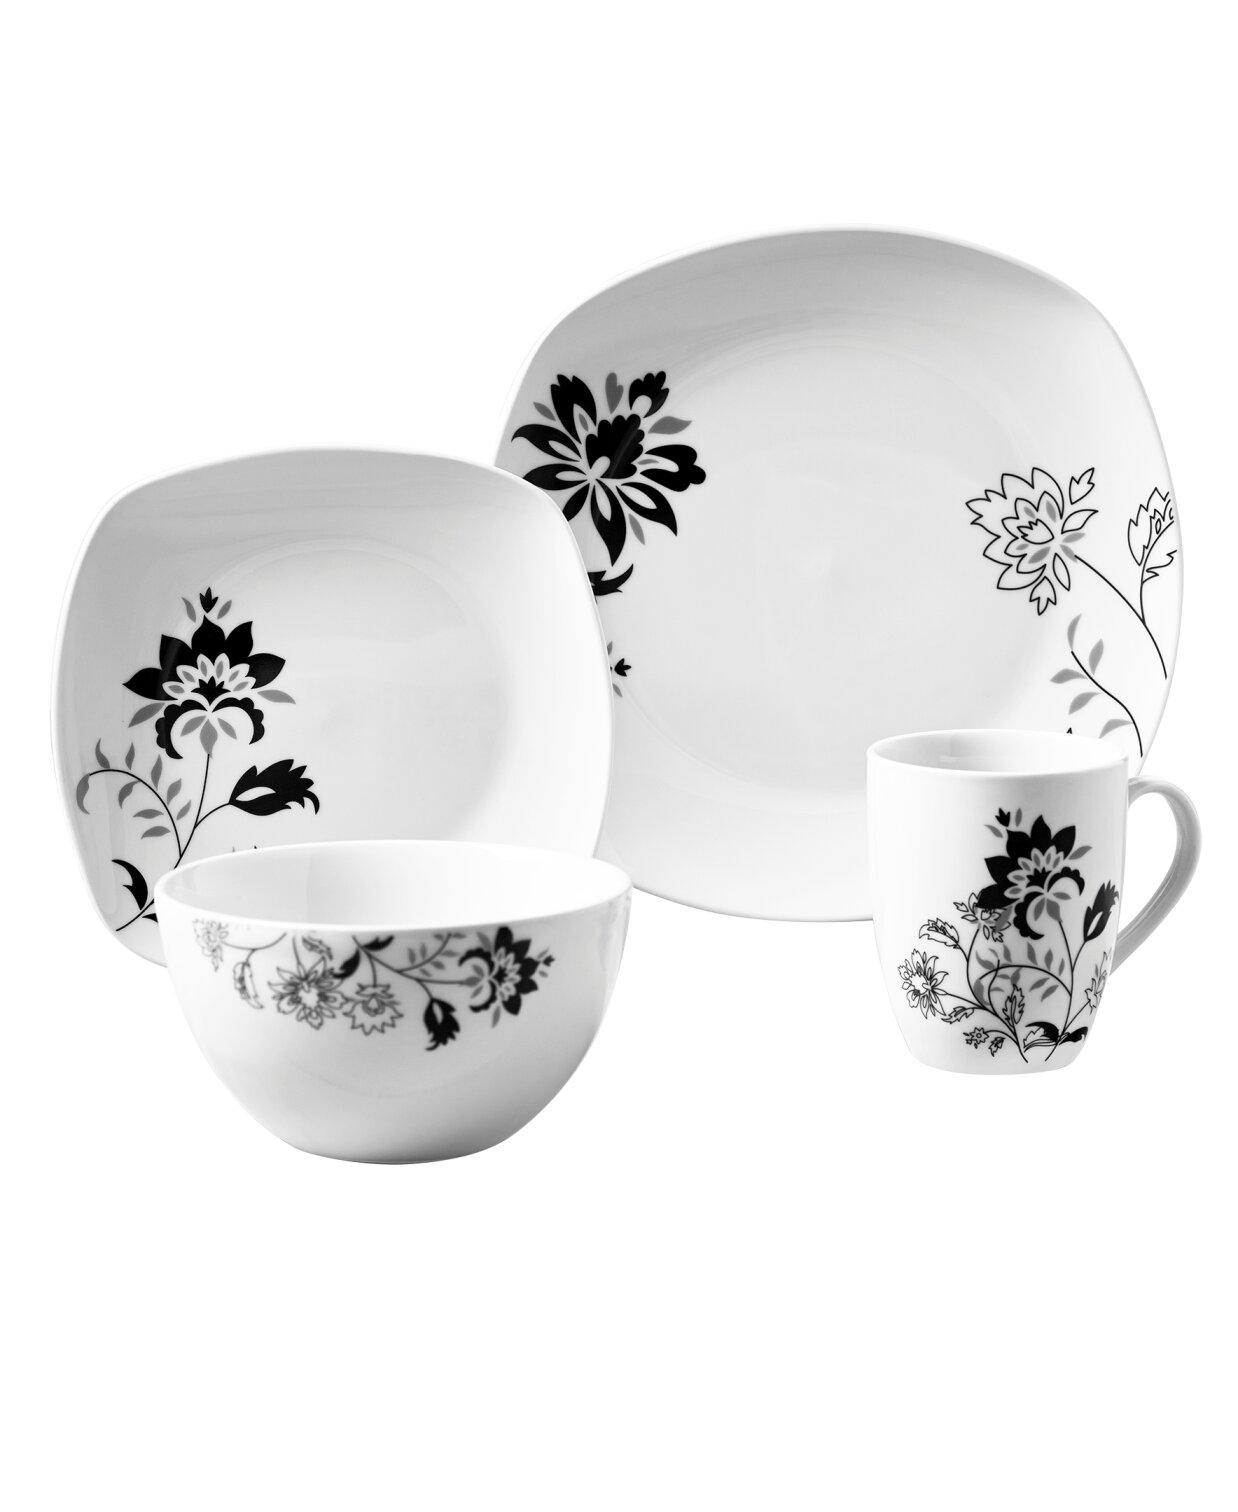 Tabletops Gallery Rebecca 16 Piece Dinnerware Set, Service For 4 U0026 Reviews  | Wayfair